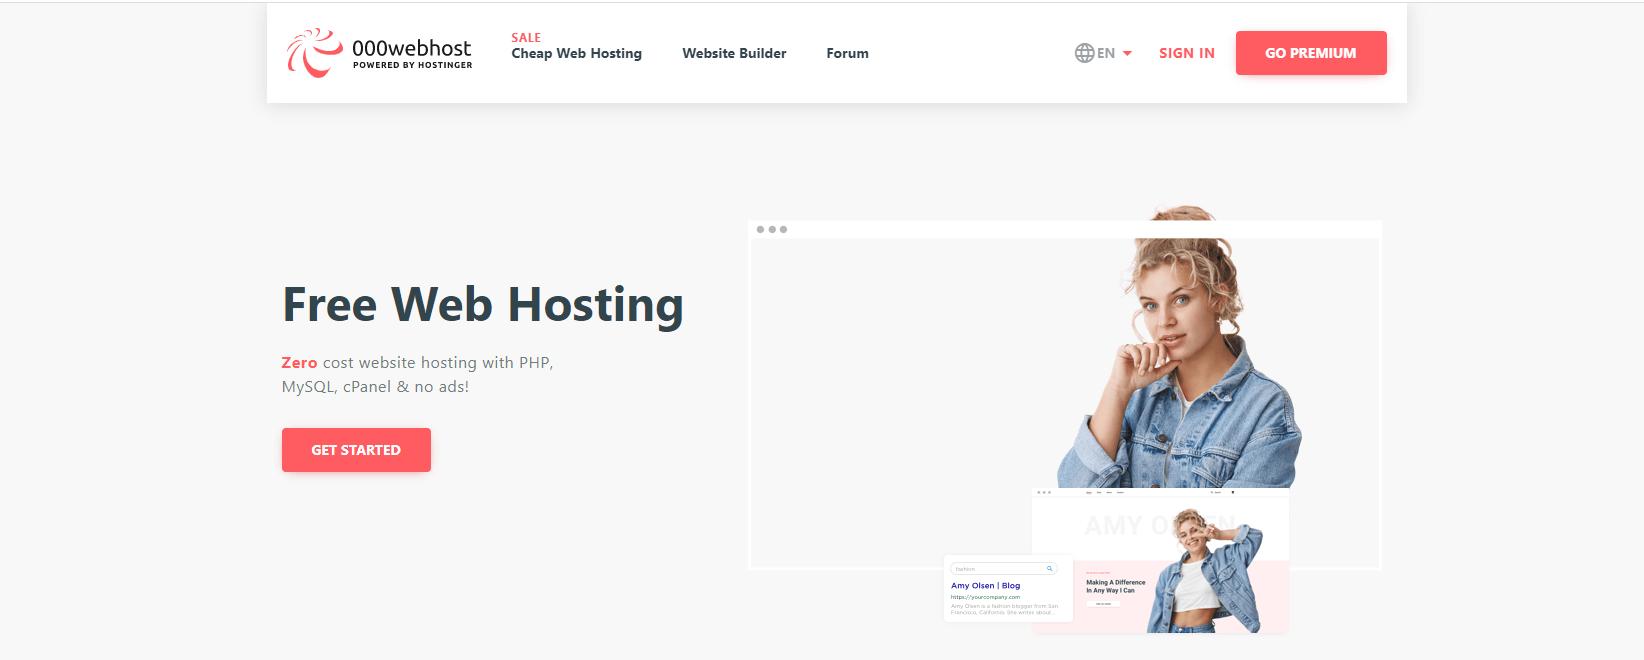 000WebHost网站托管。